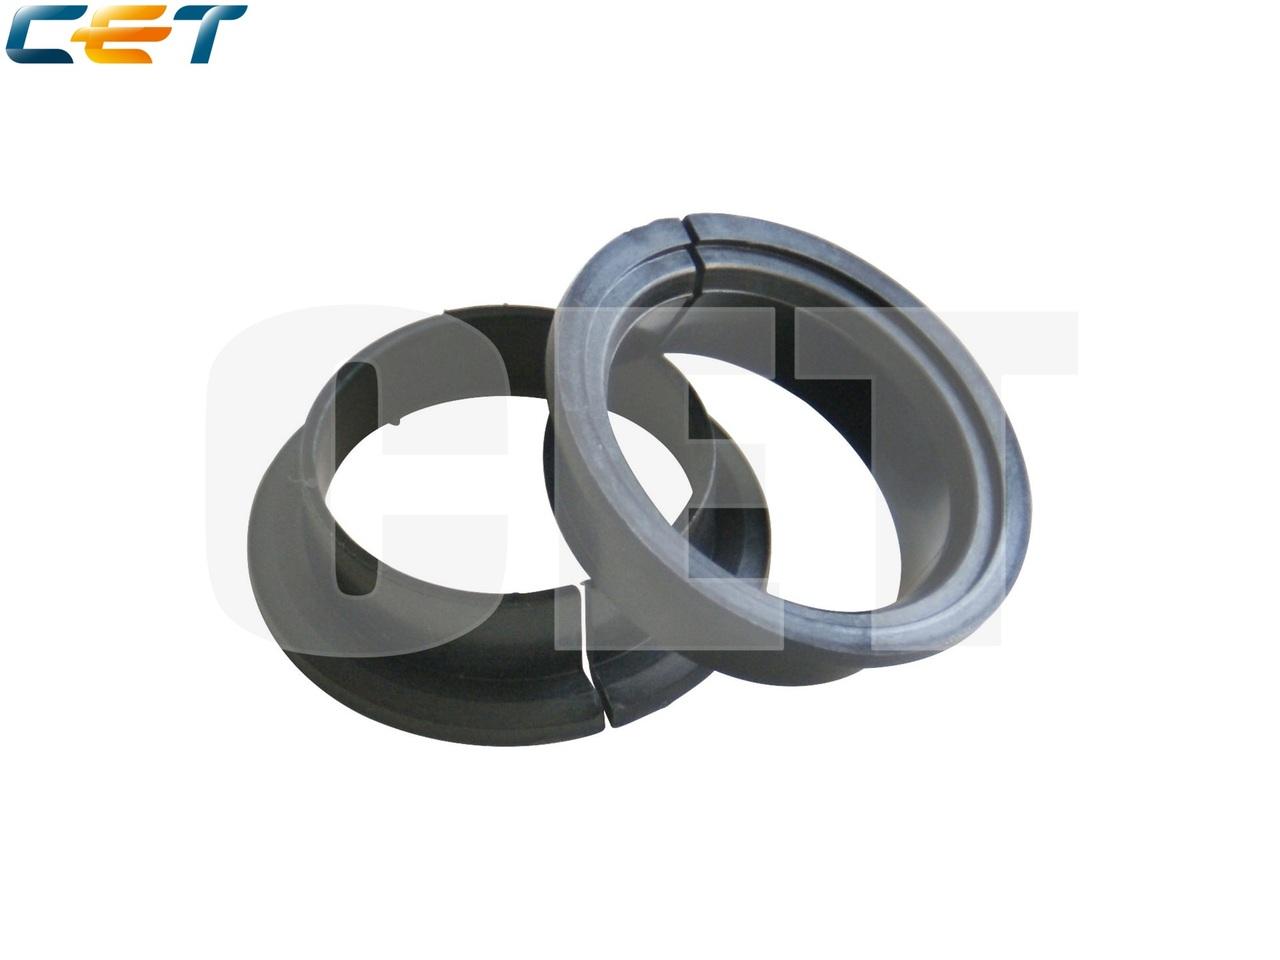 Бушинг тефлонового вала FB5-3613-000 для CANONiR5000/6000 (CET), 2 шт/компл, CET5143